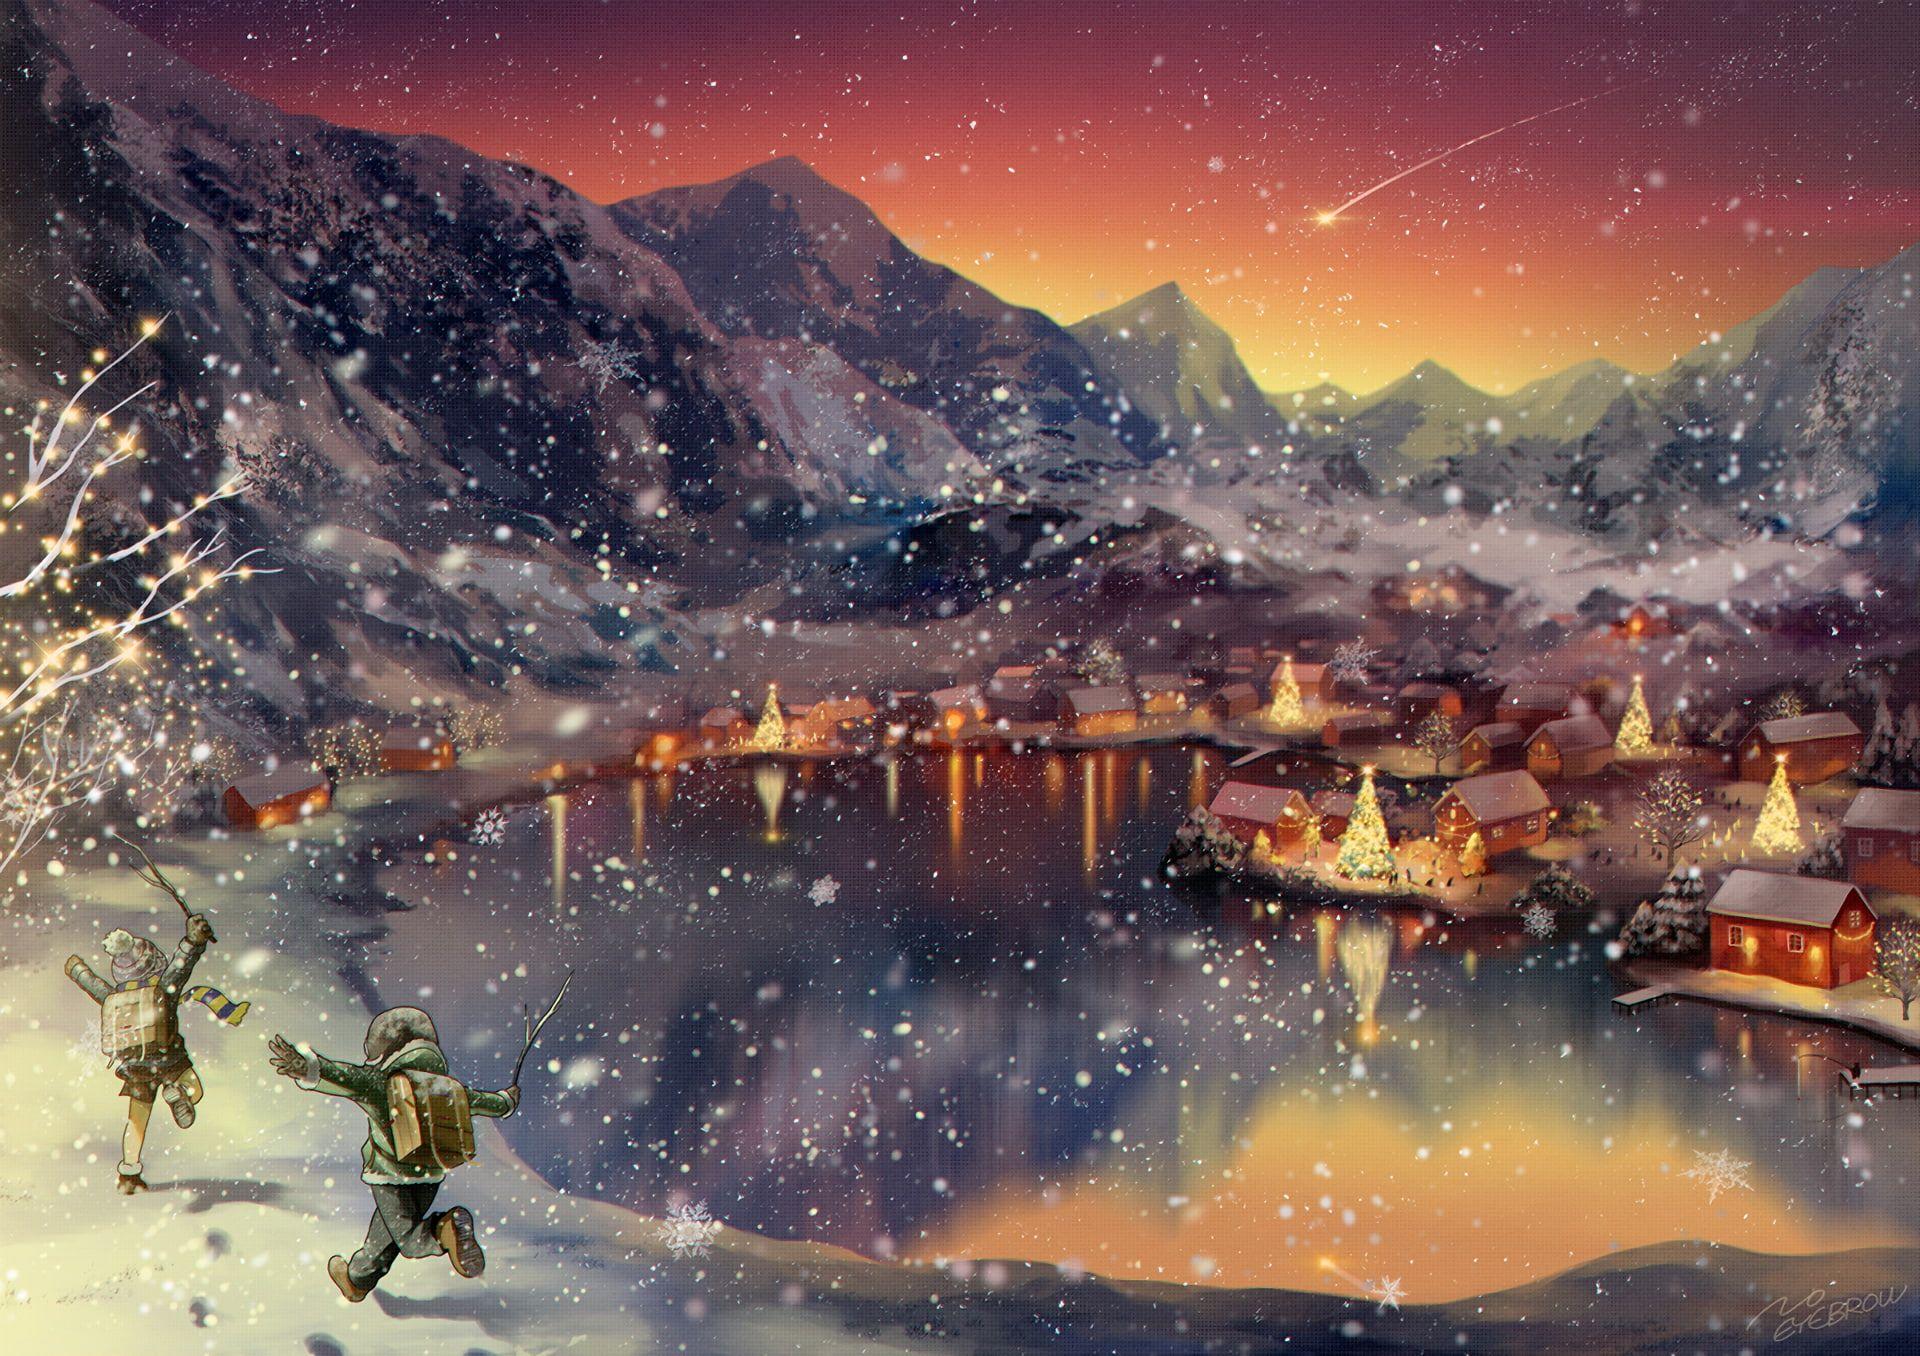 Landscape Anime Winter Mountains Sunset Artwork Lake Christmas 1080p Wallpaper Hdwallpa Beautiful Scenery Wallpaper Scenery Wallpaper Sunset Artwork